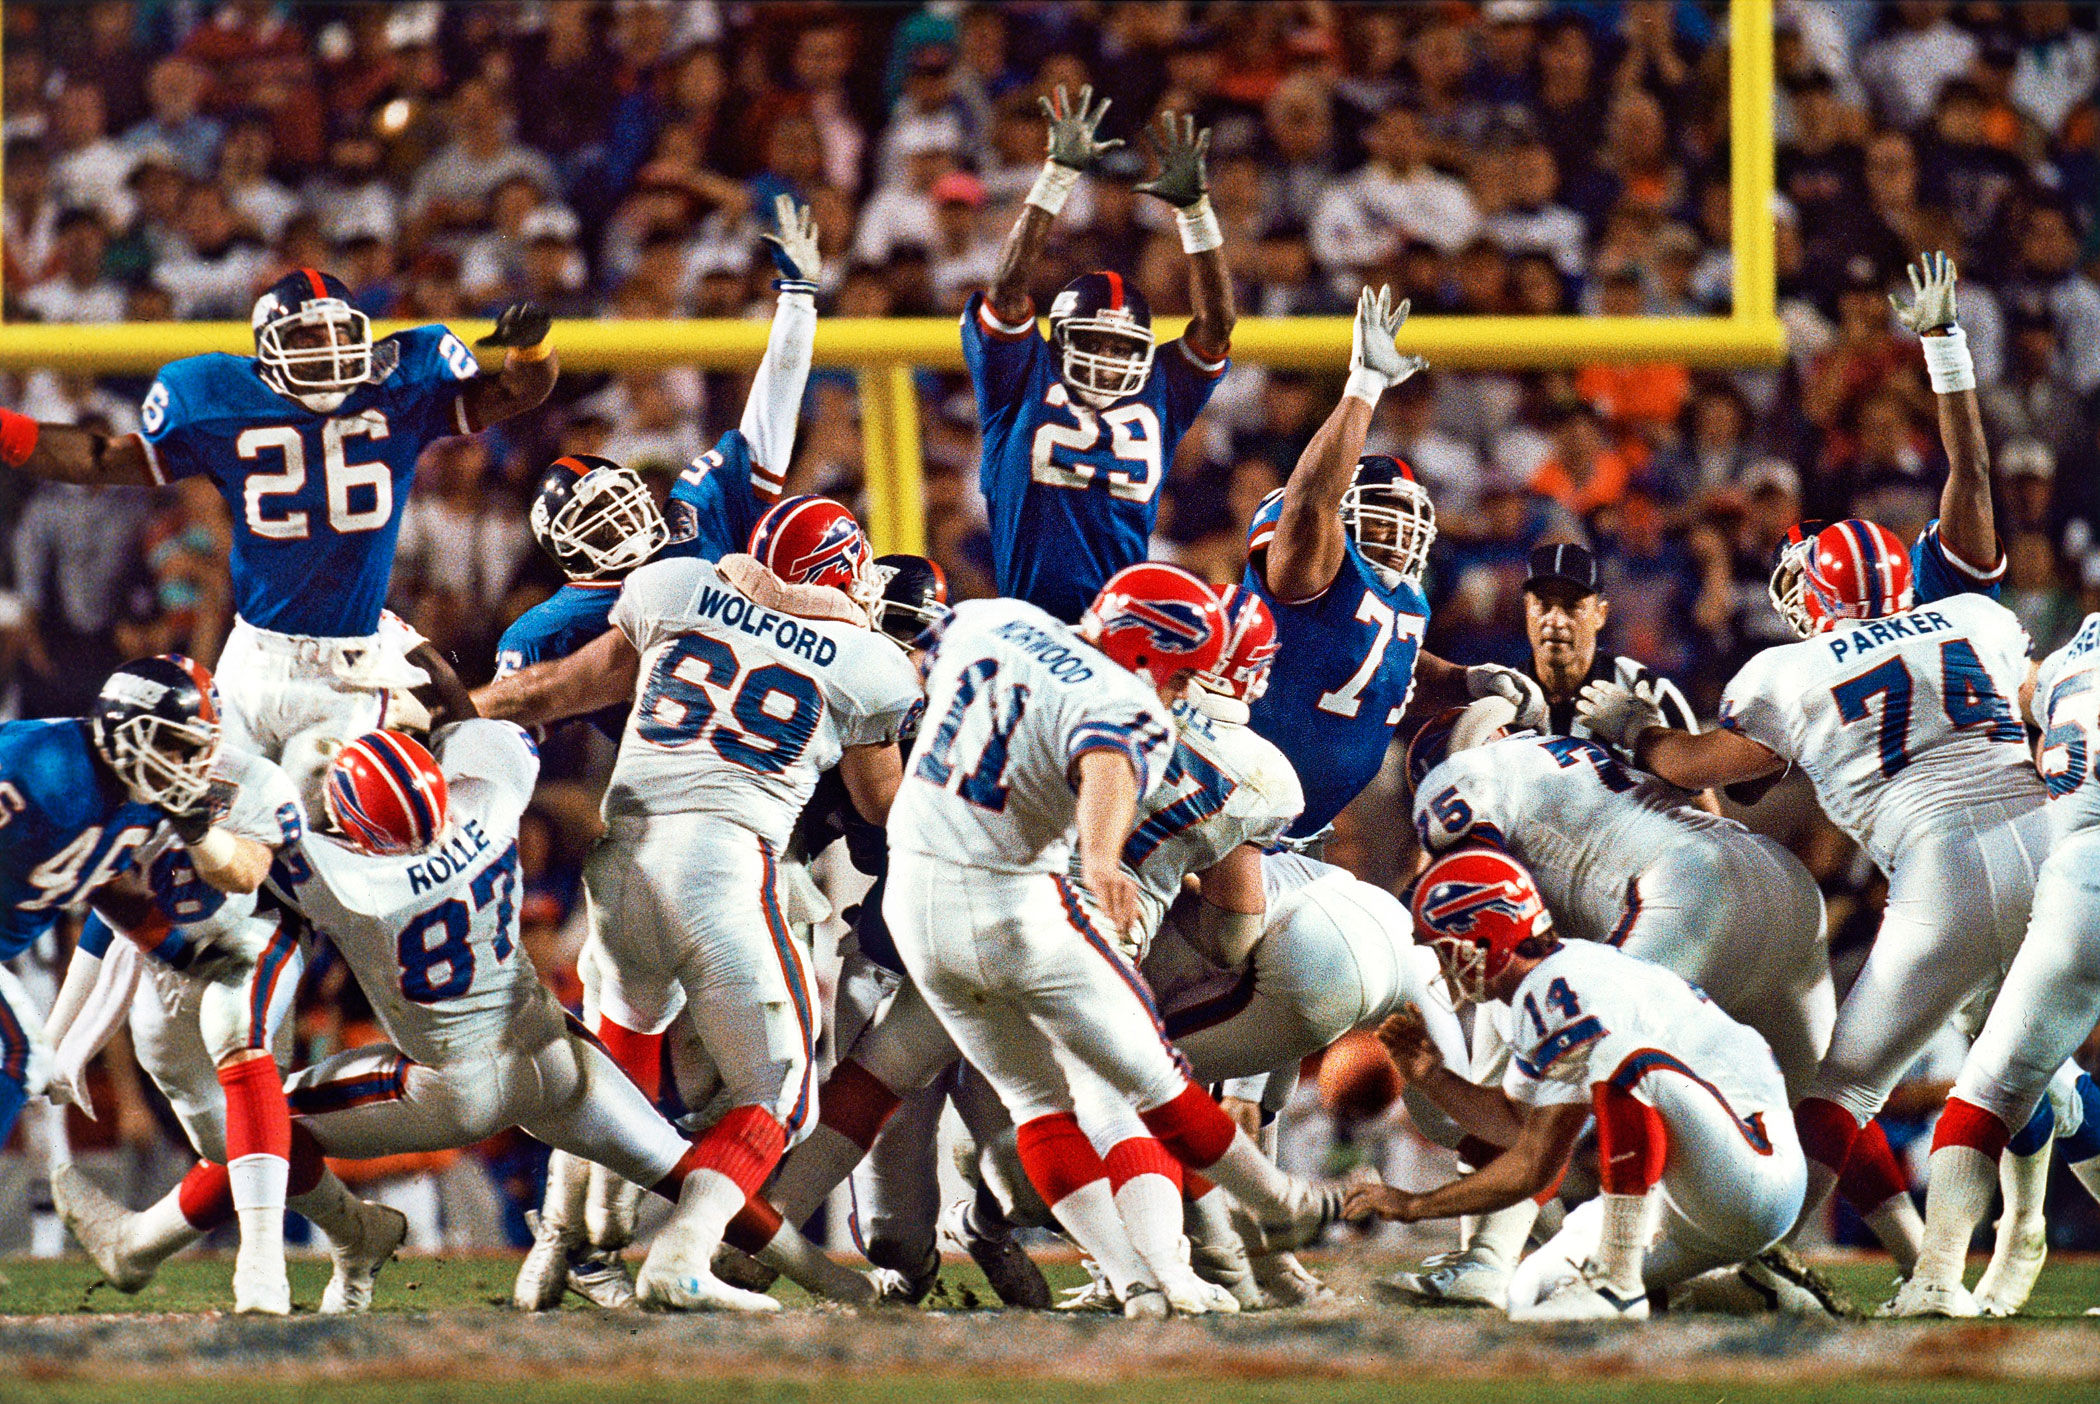 Super Bowl XXV, Jan. 27, 1991                               Buffalo Bills vs New York Giants in Tampa, Fla.